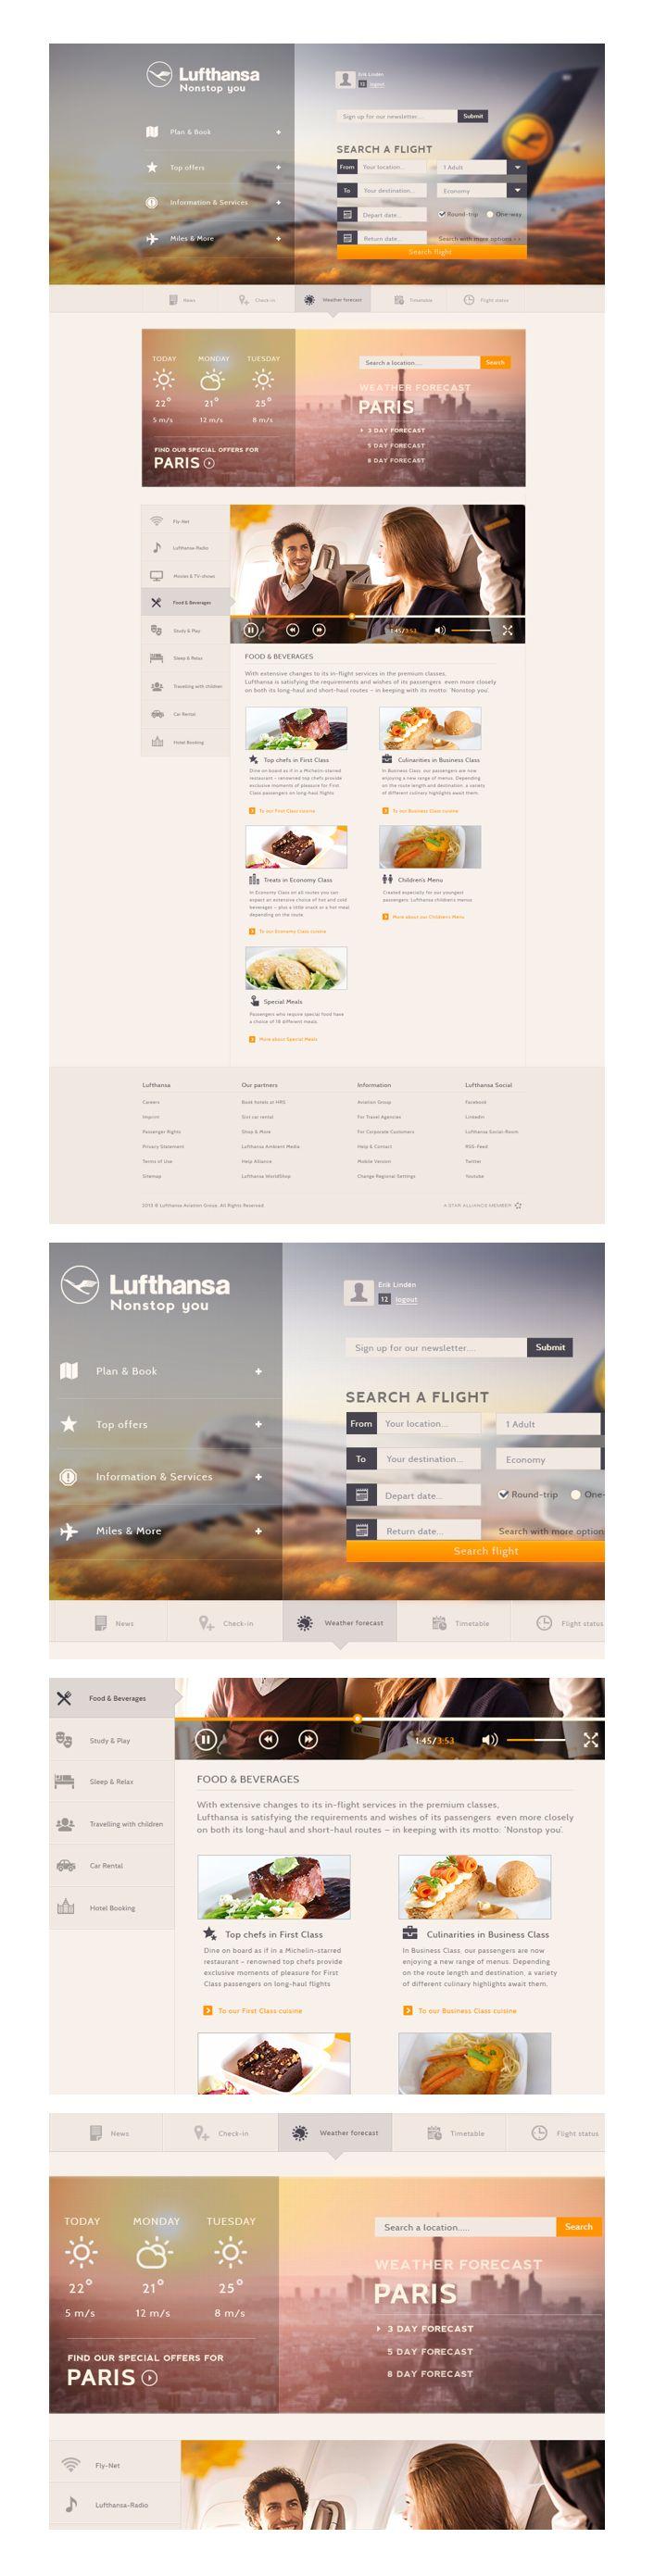 Lufthansa Concept on Behance